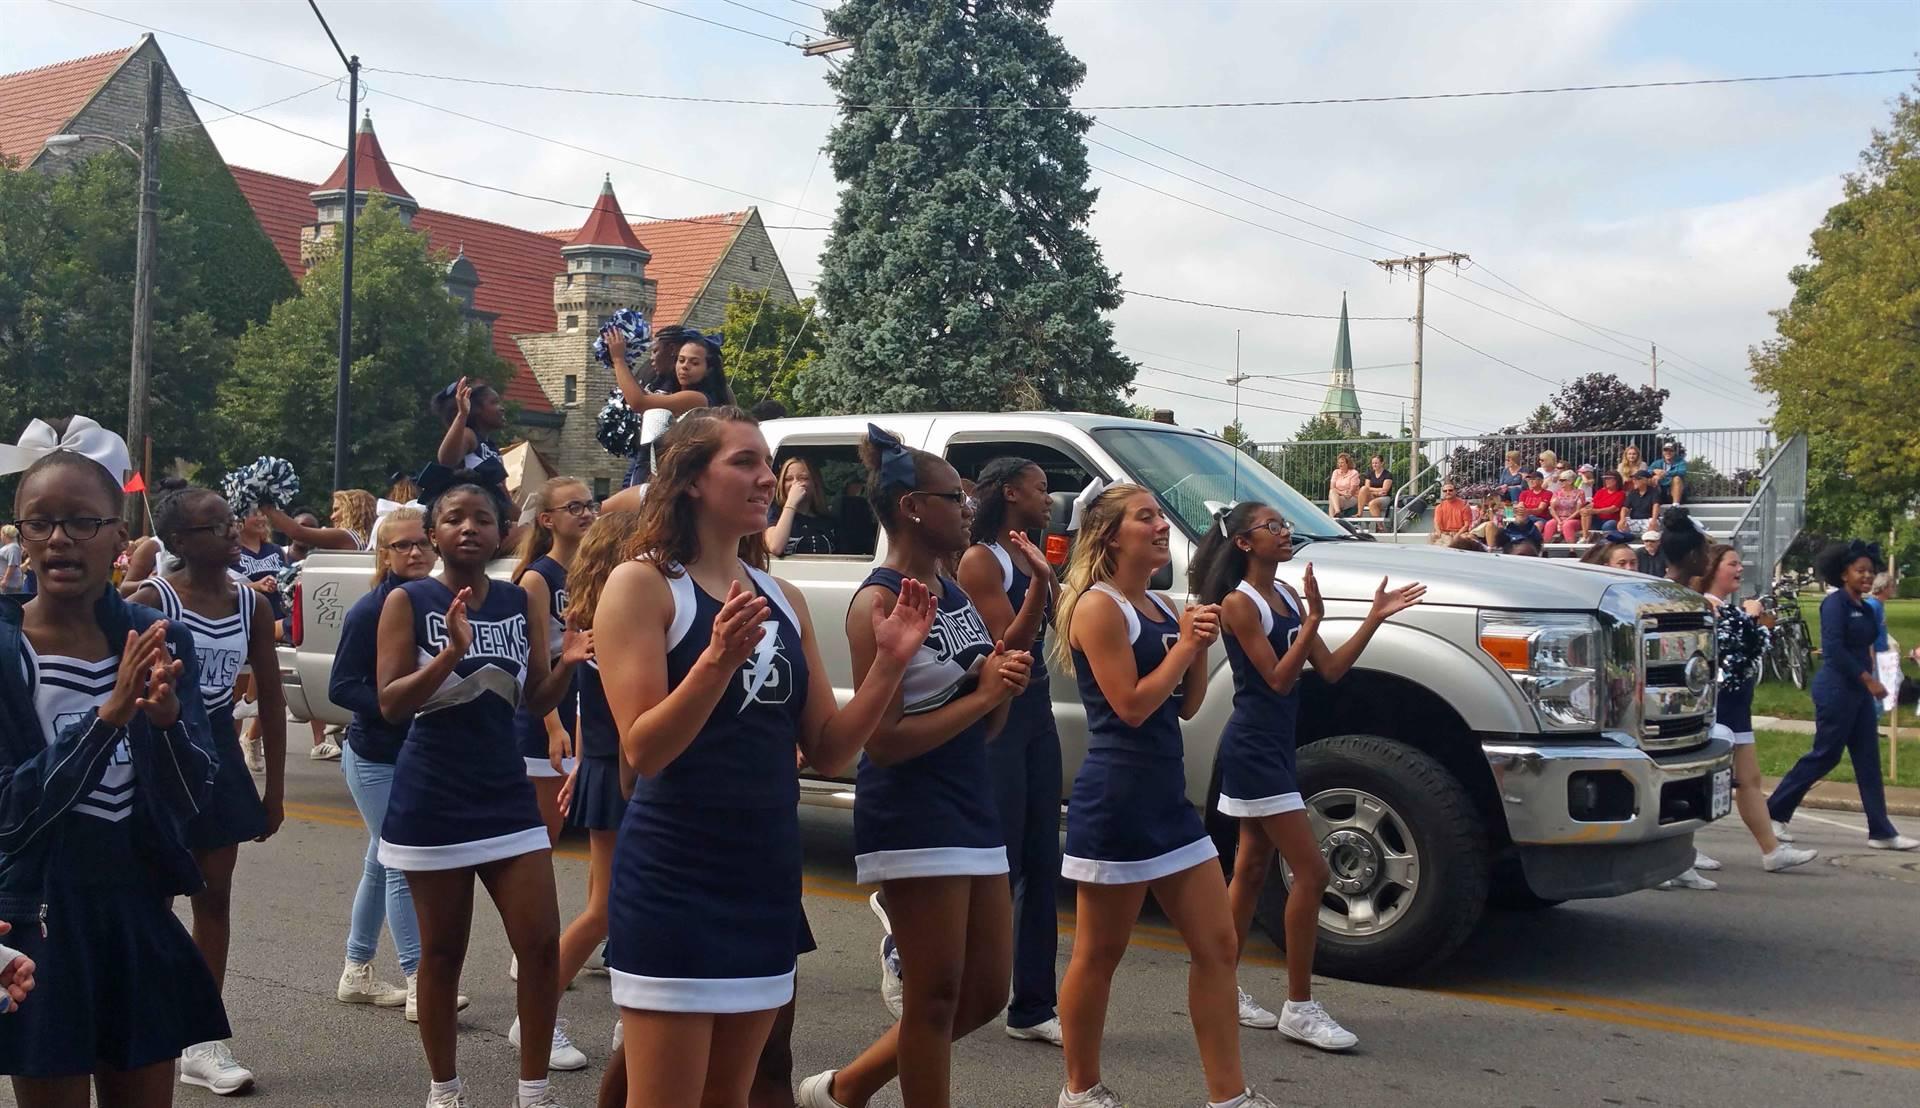 SHS Cheerleaders - Bicentennial Parade 2018